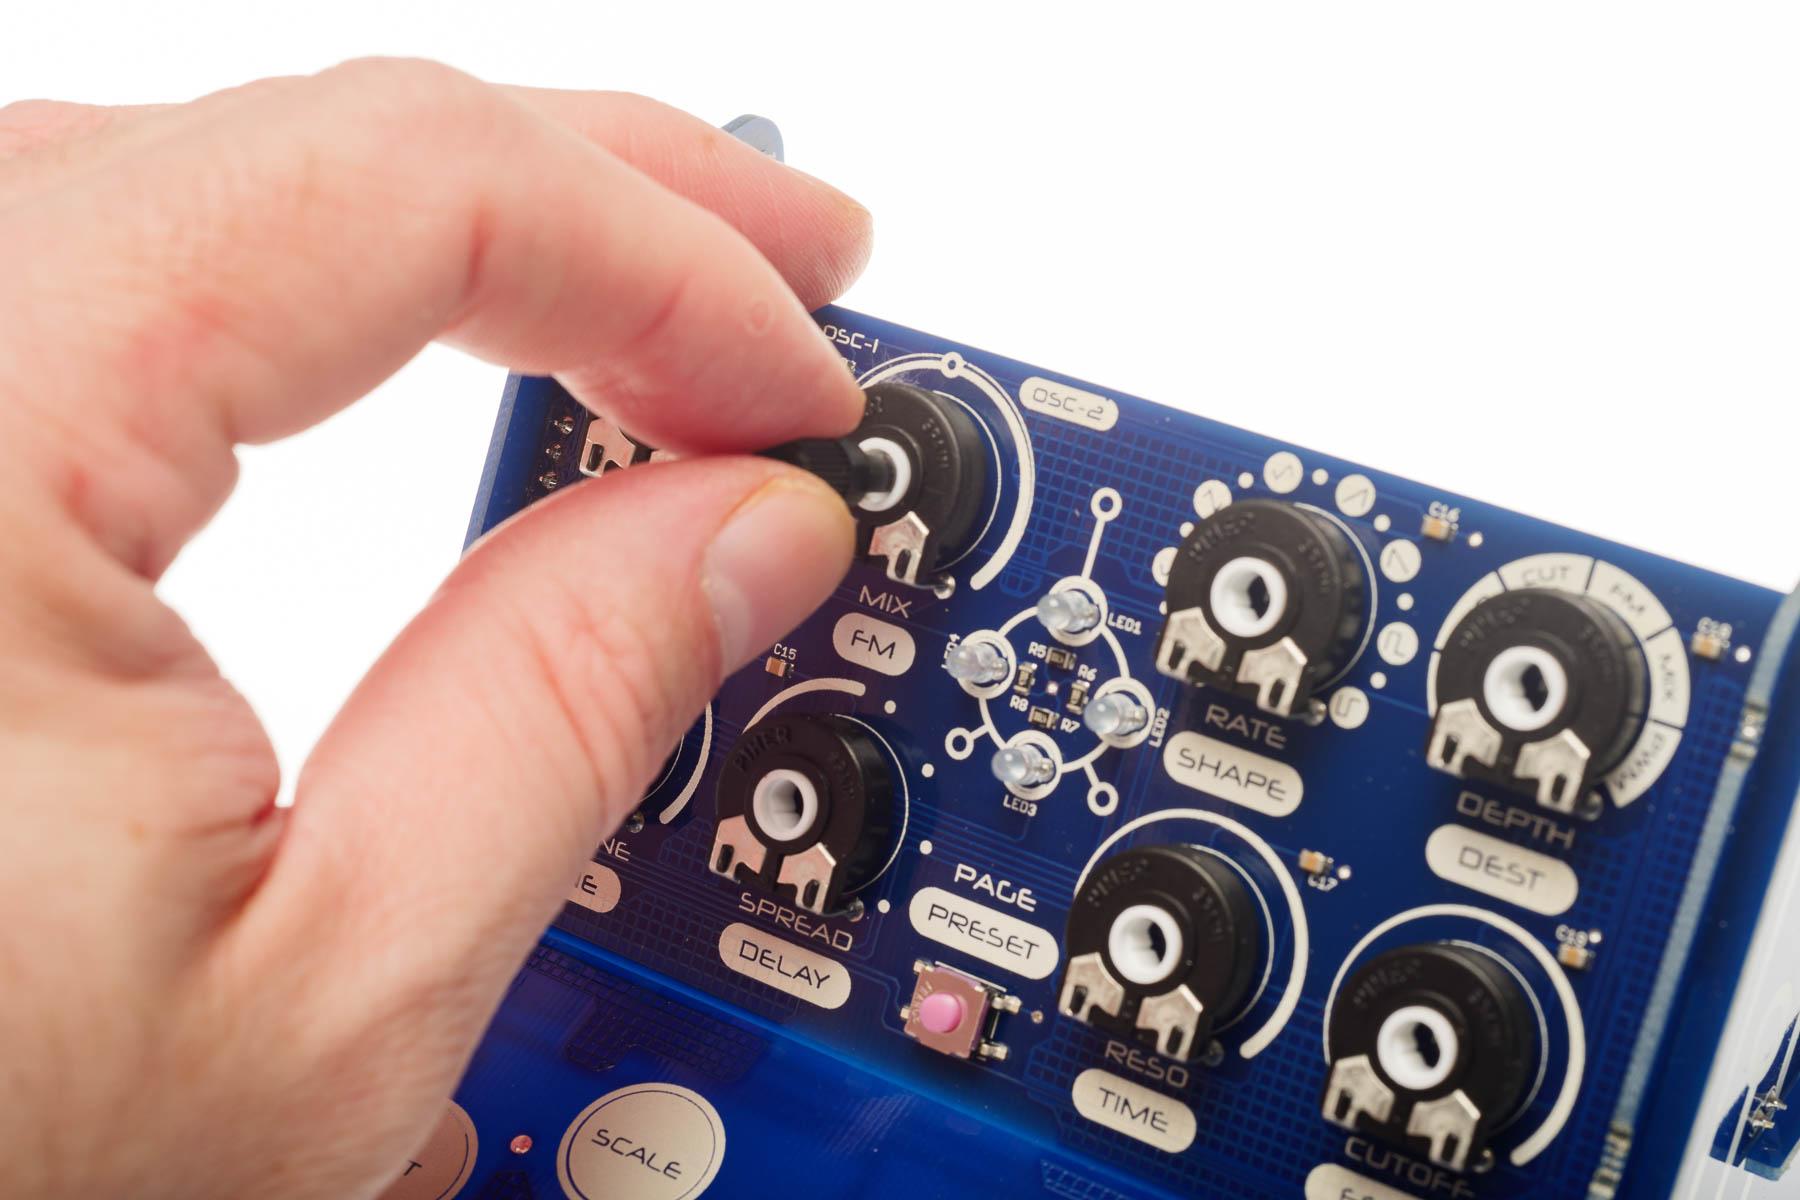 Modal CRAFTsynth kit DSP board